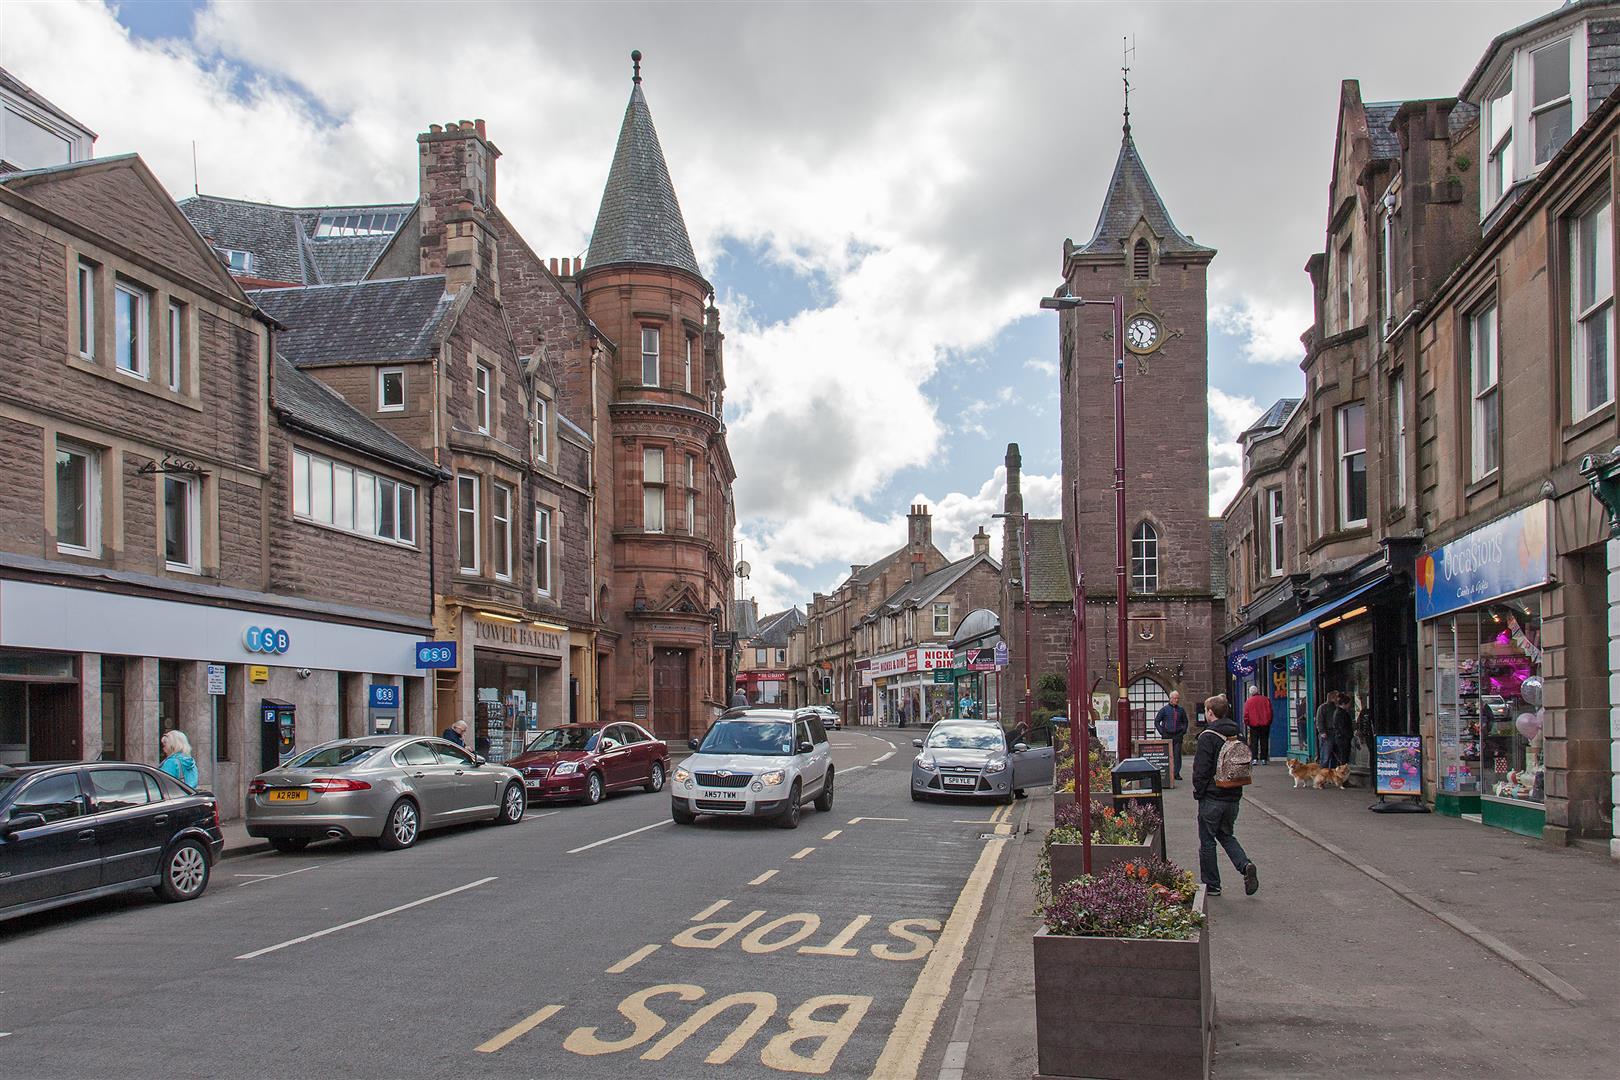 43, North Bridge Street, Crieff, Perthshire, PH7 3HJ, UK